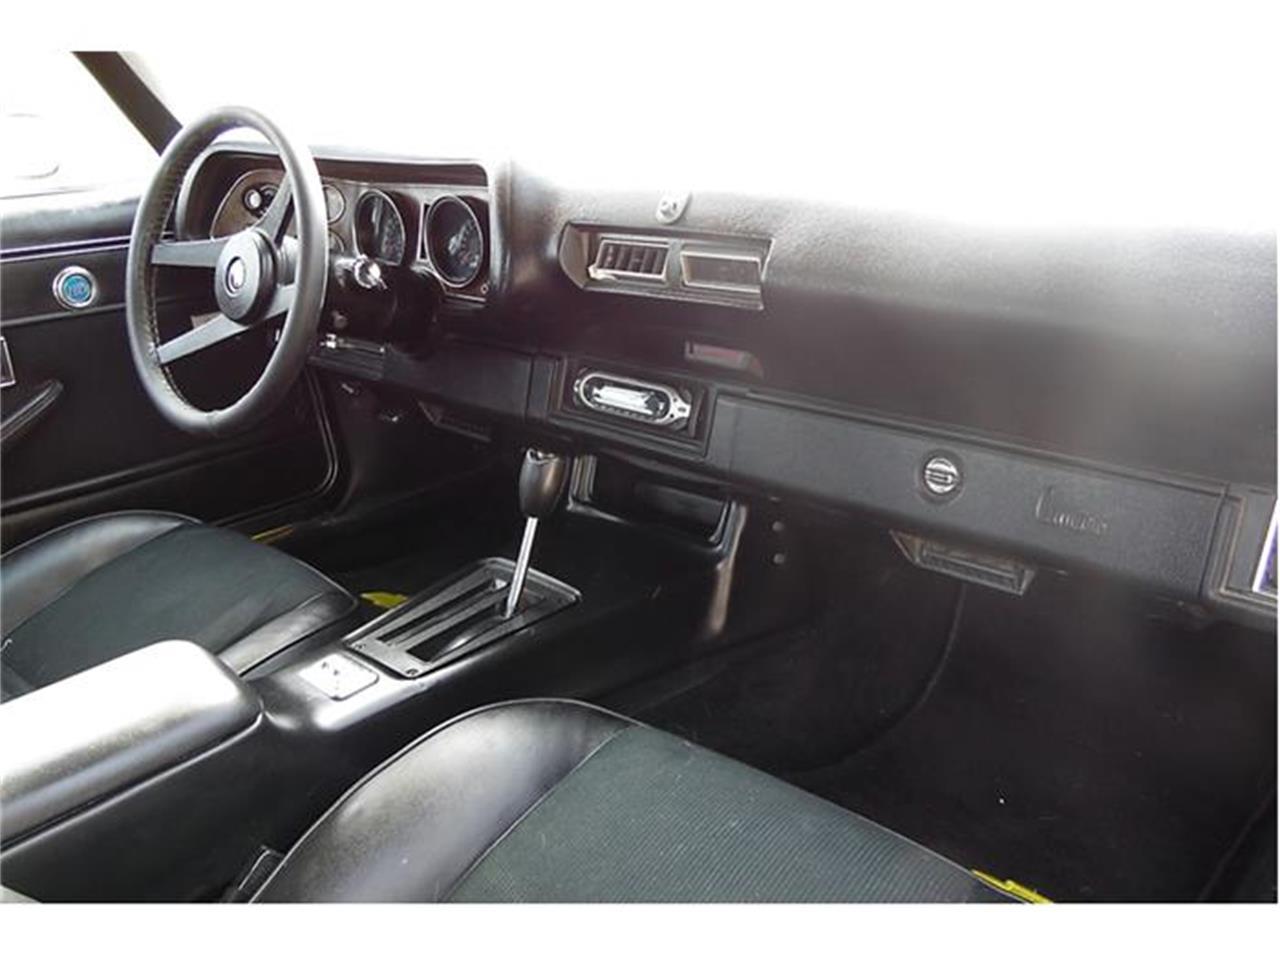 Large Picture of '74 Chevrolet Camaro located in Redlands California - $9,995.00 - GP98